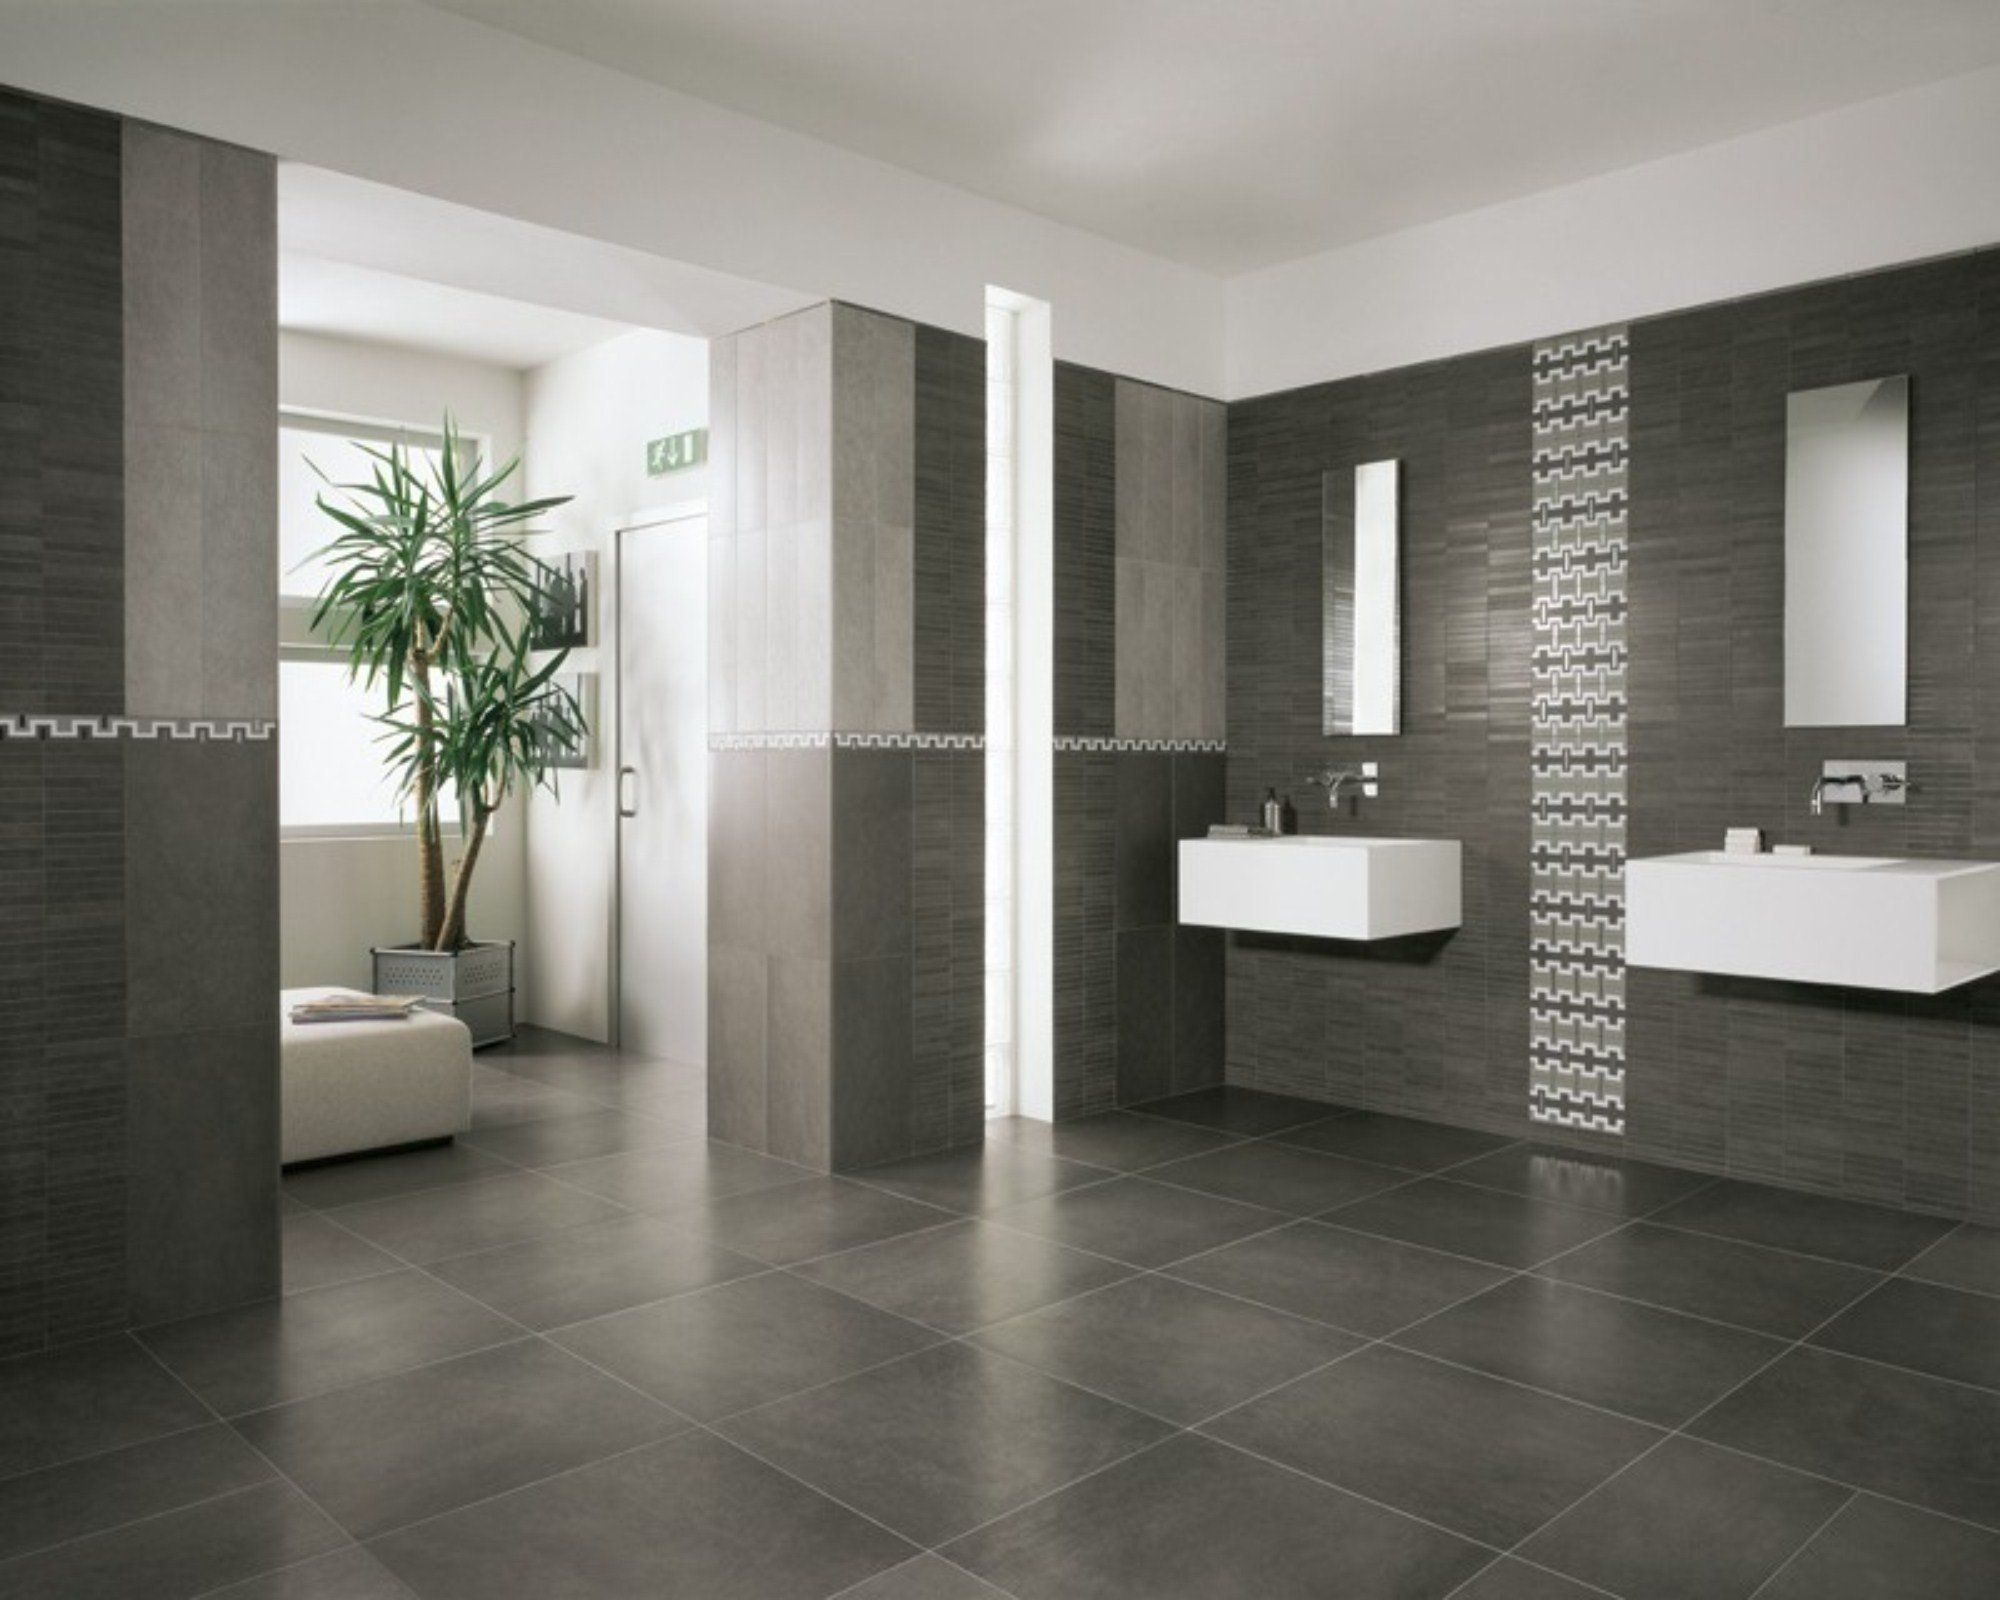 34 Luxury Ceramic Tiles Bathroom Decortez Bathroom Wall Tile Design Grey Bathroom Floor Bathroom Design Luxury